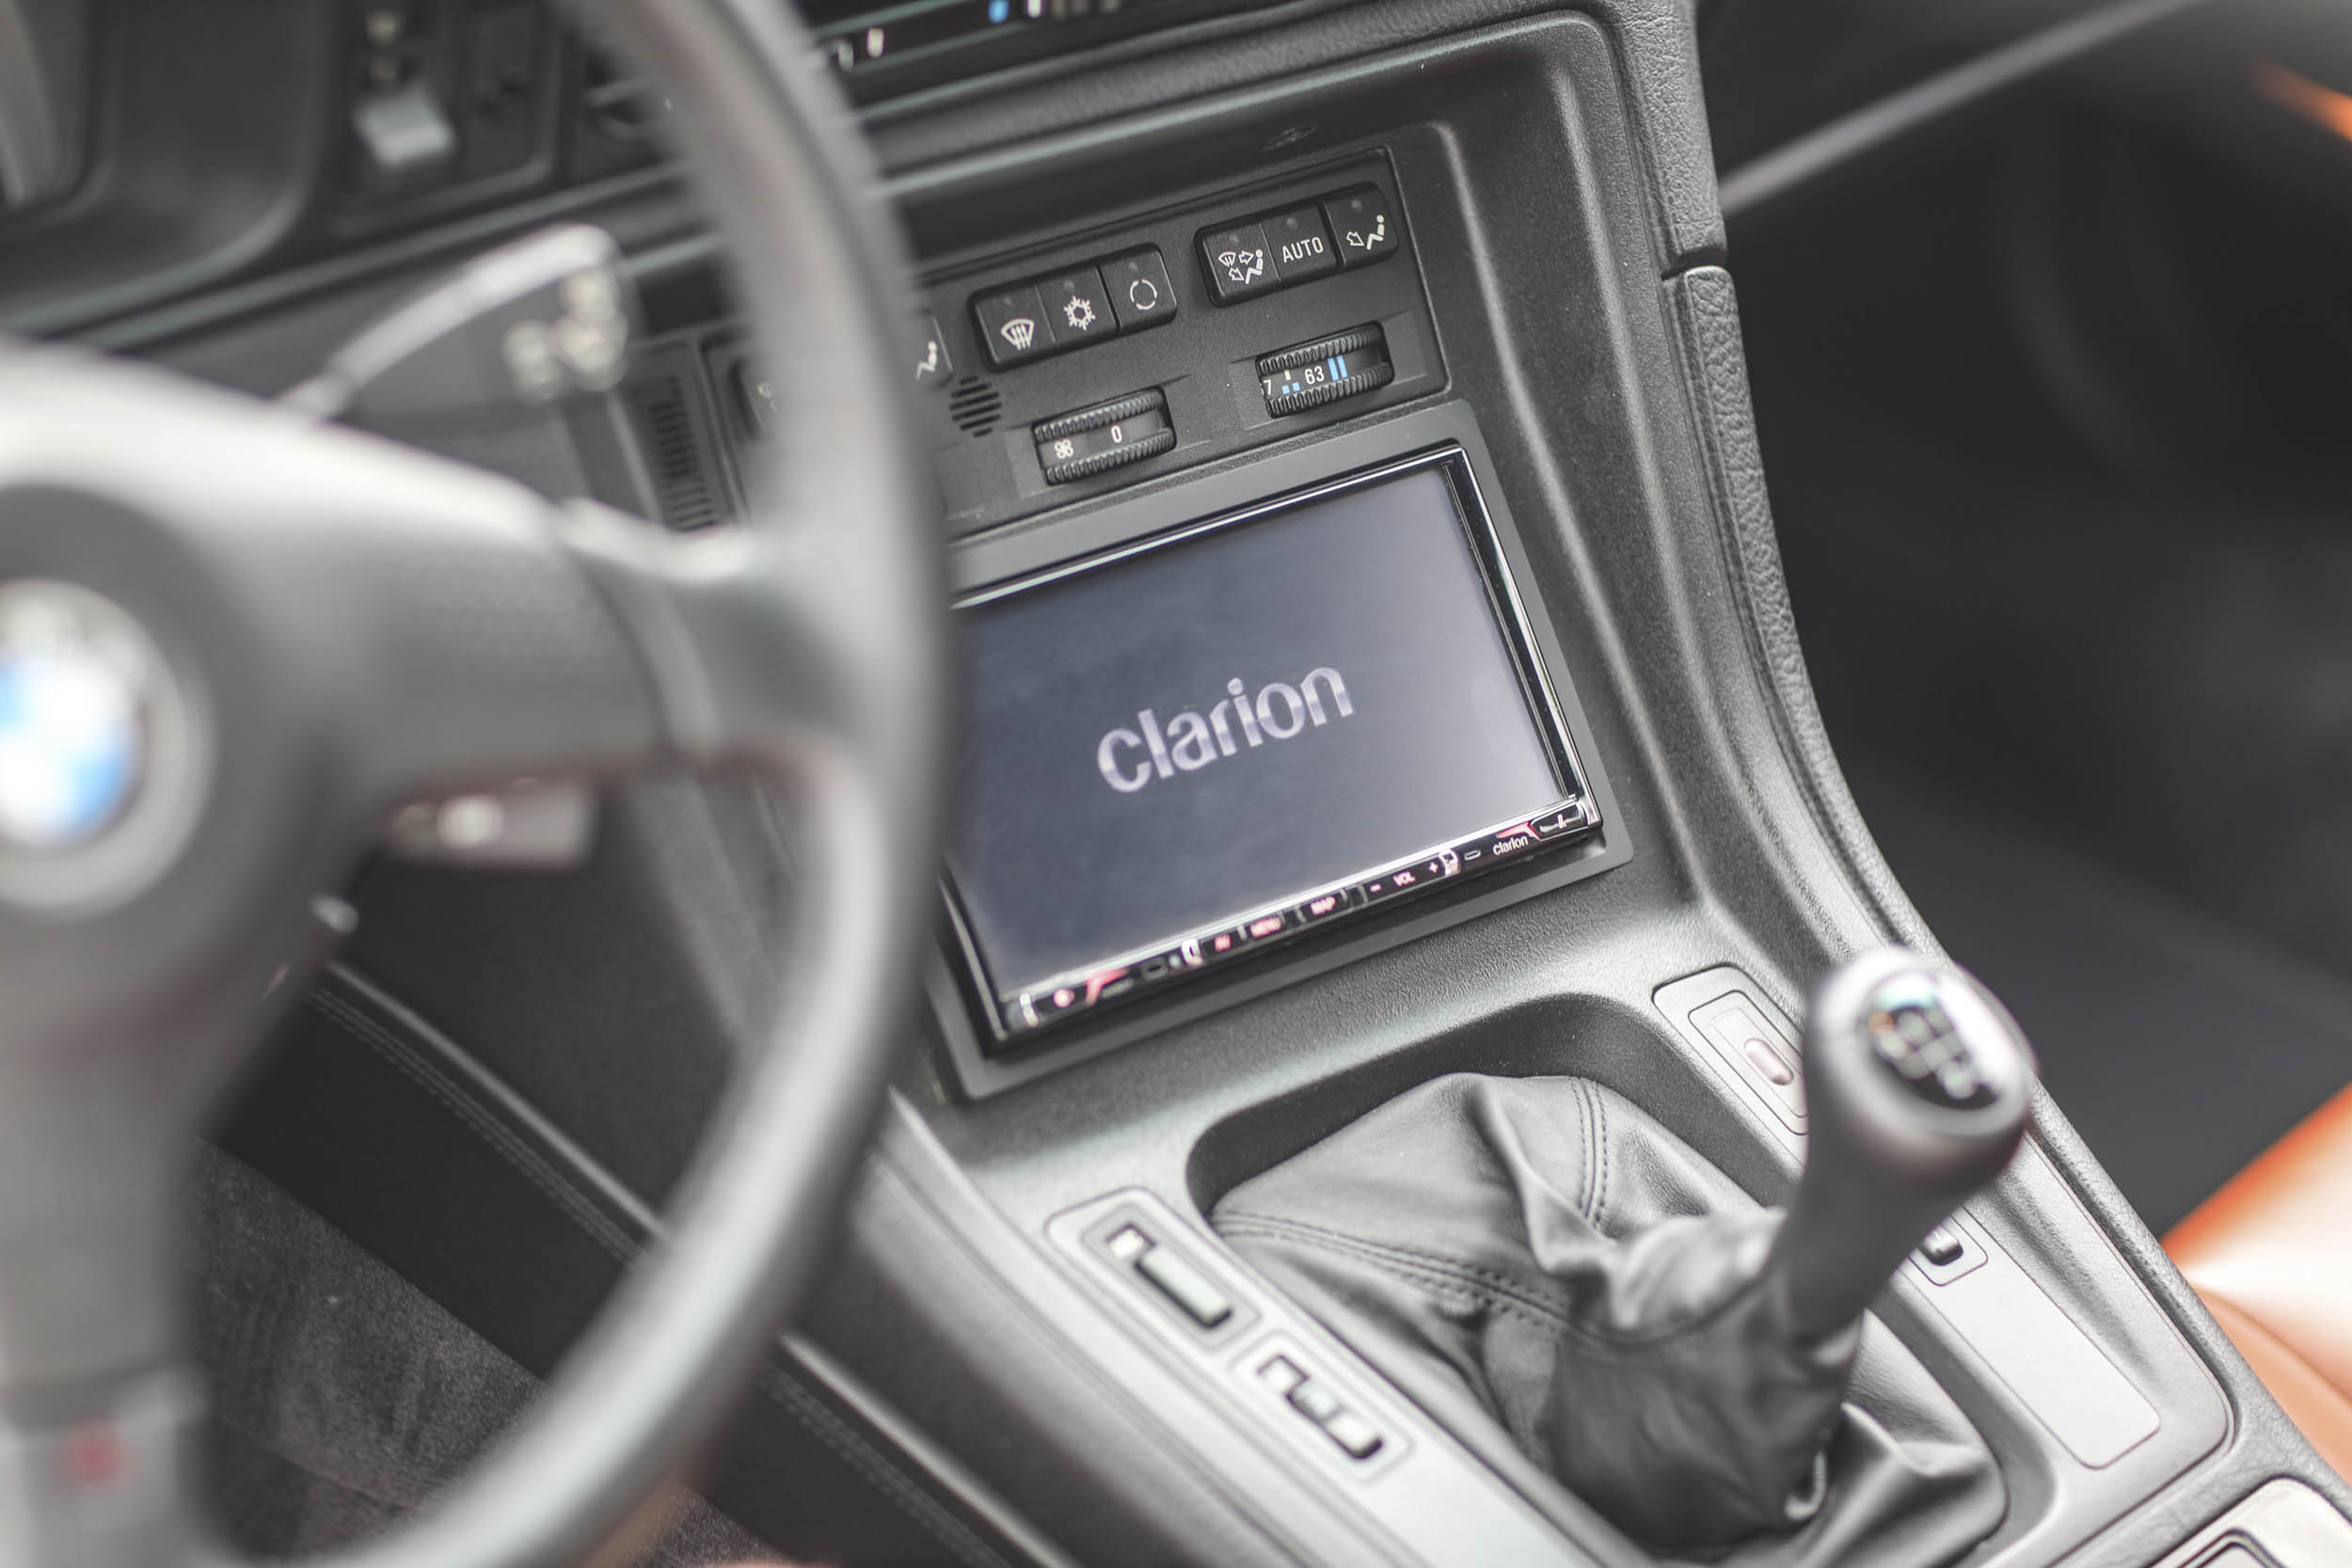 1993 BMW 850Ci shifter knob and Clarion radio